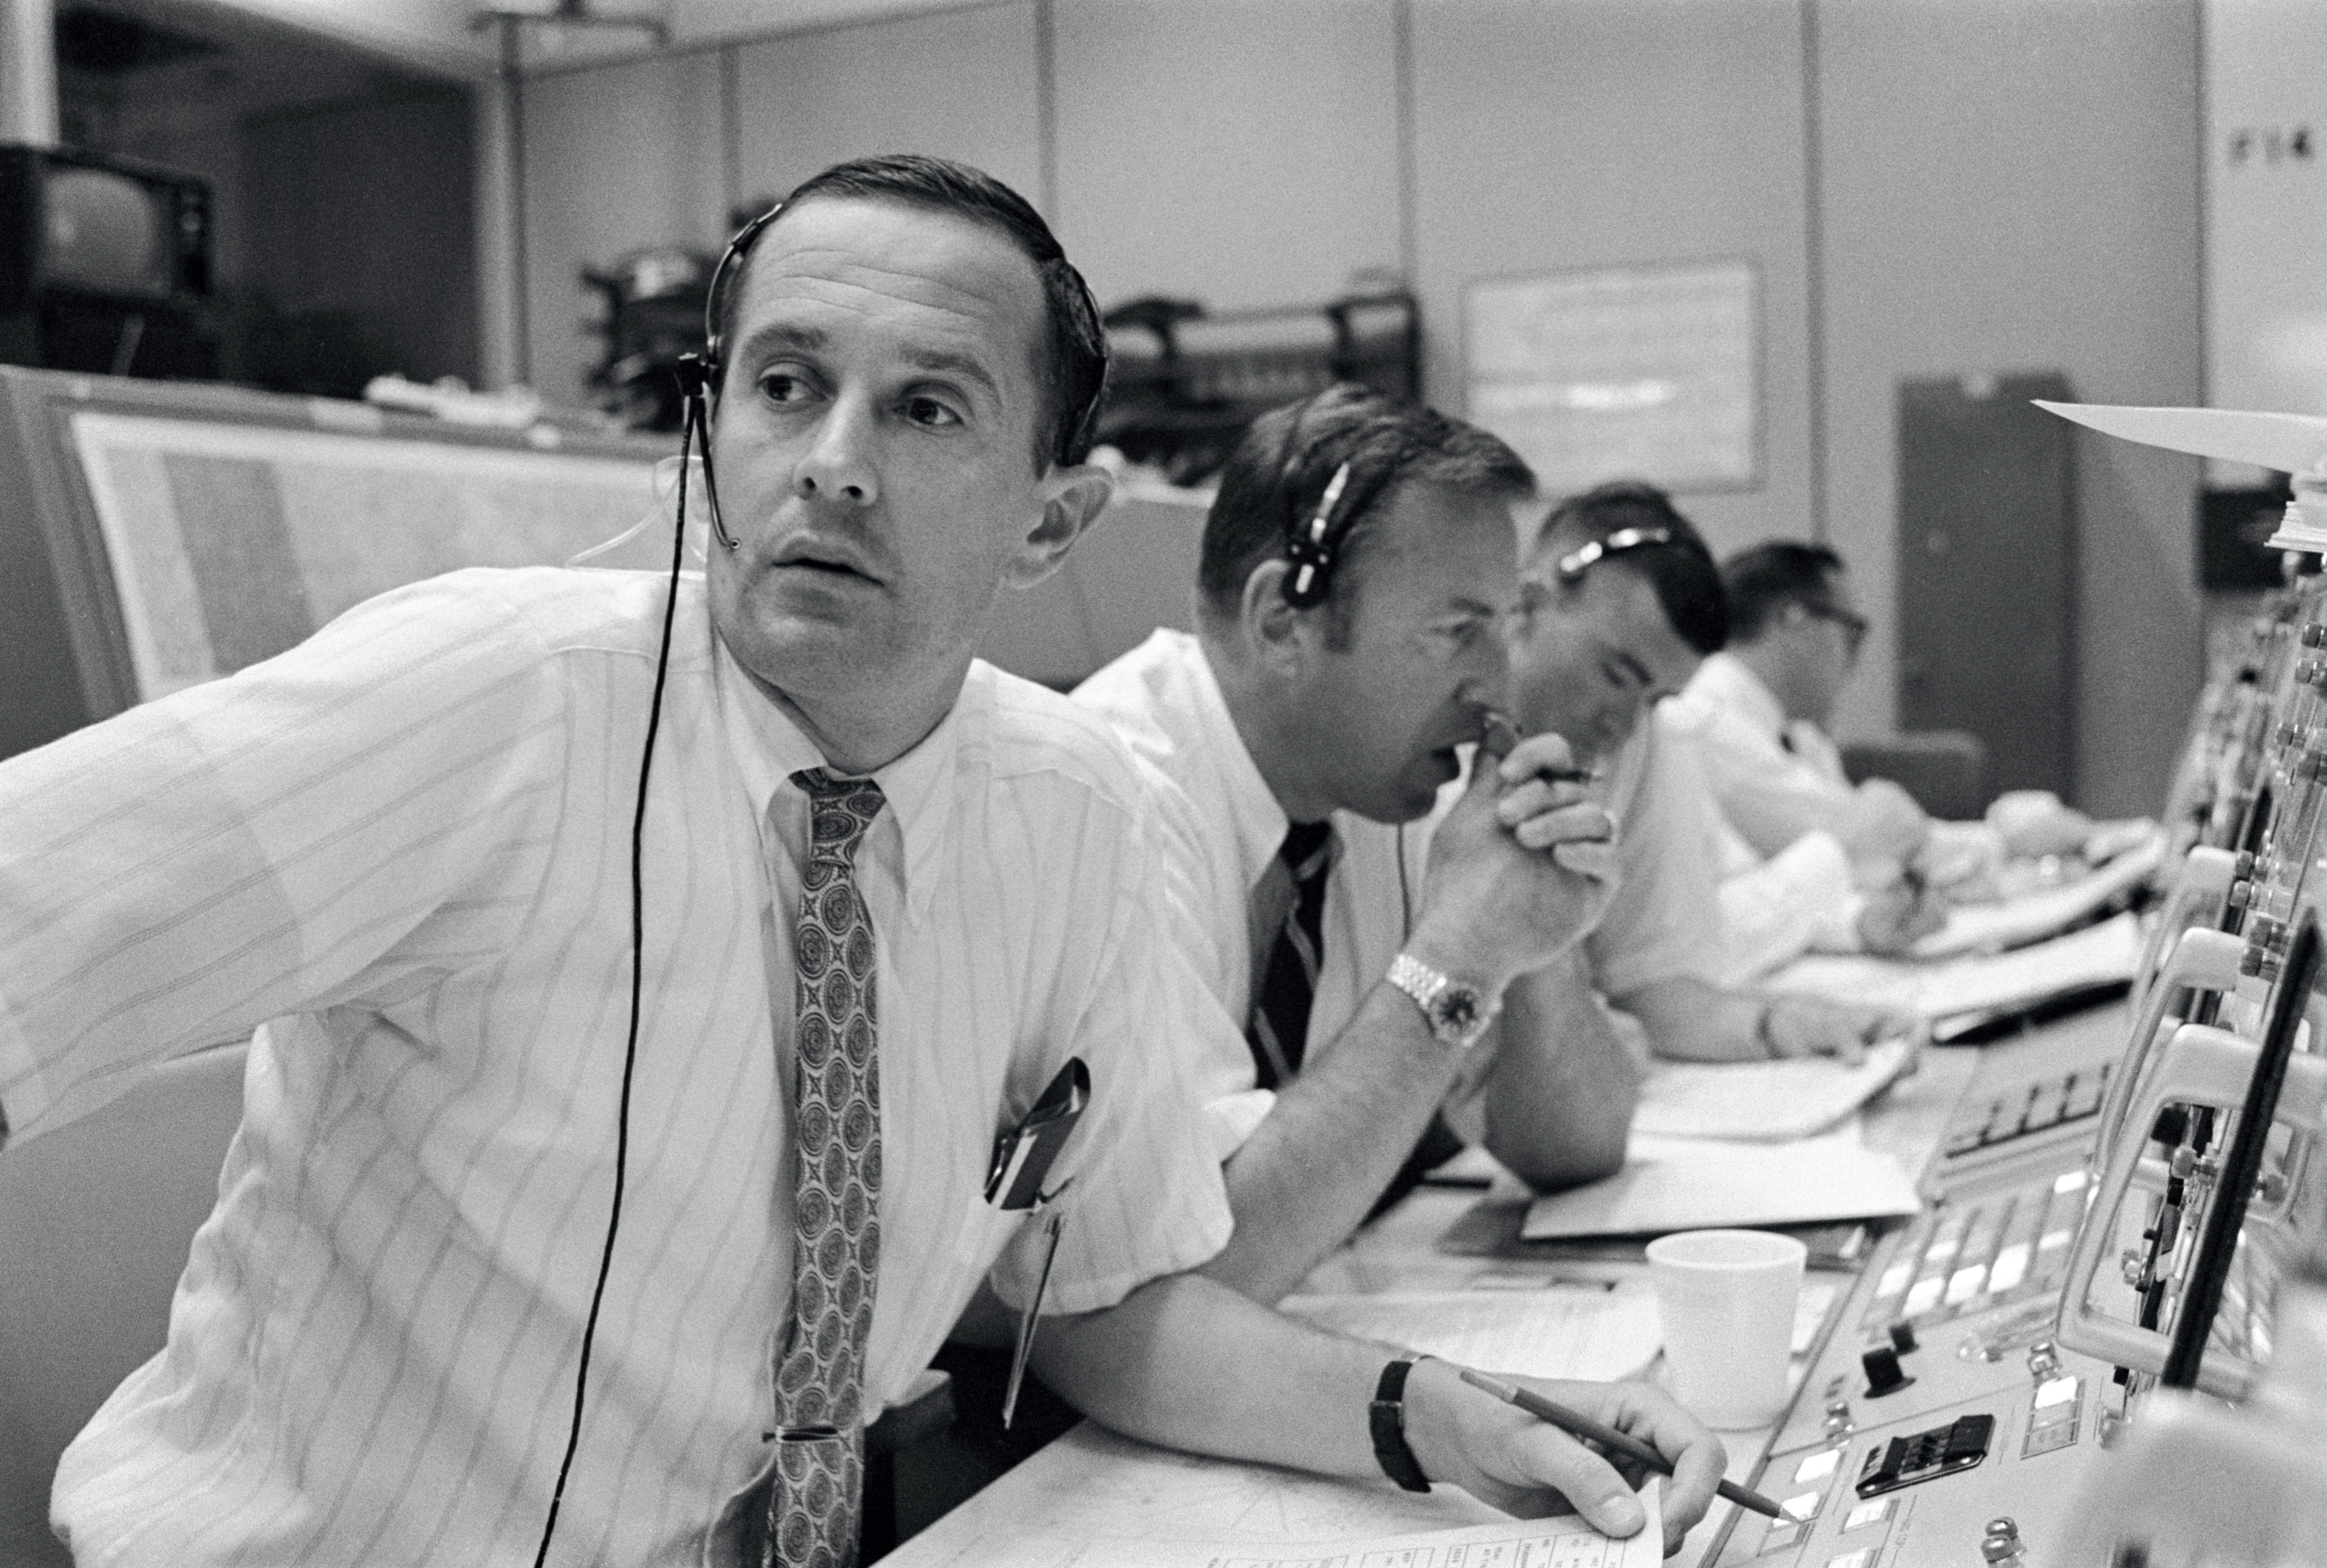 Duke,_Lovell_and_Haise_at_the_Apollo_11_Capcom,_Johnson_Space_Center,_Houston,_Texas_-_19690720.jpg